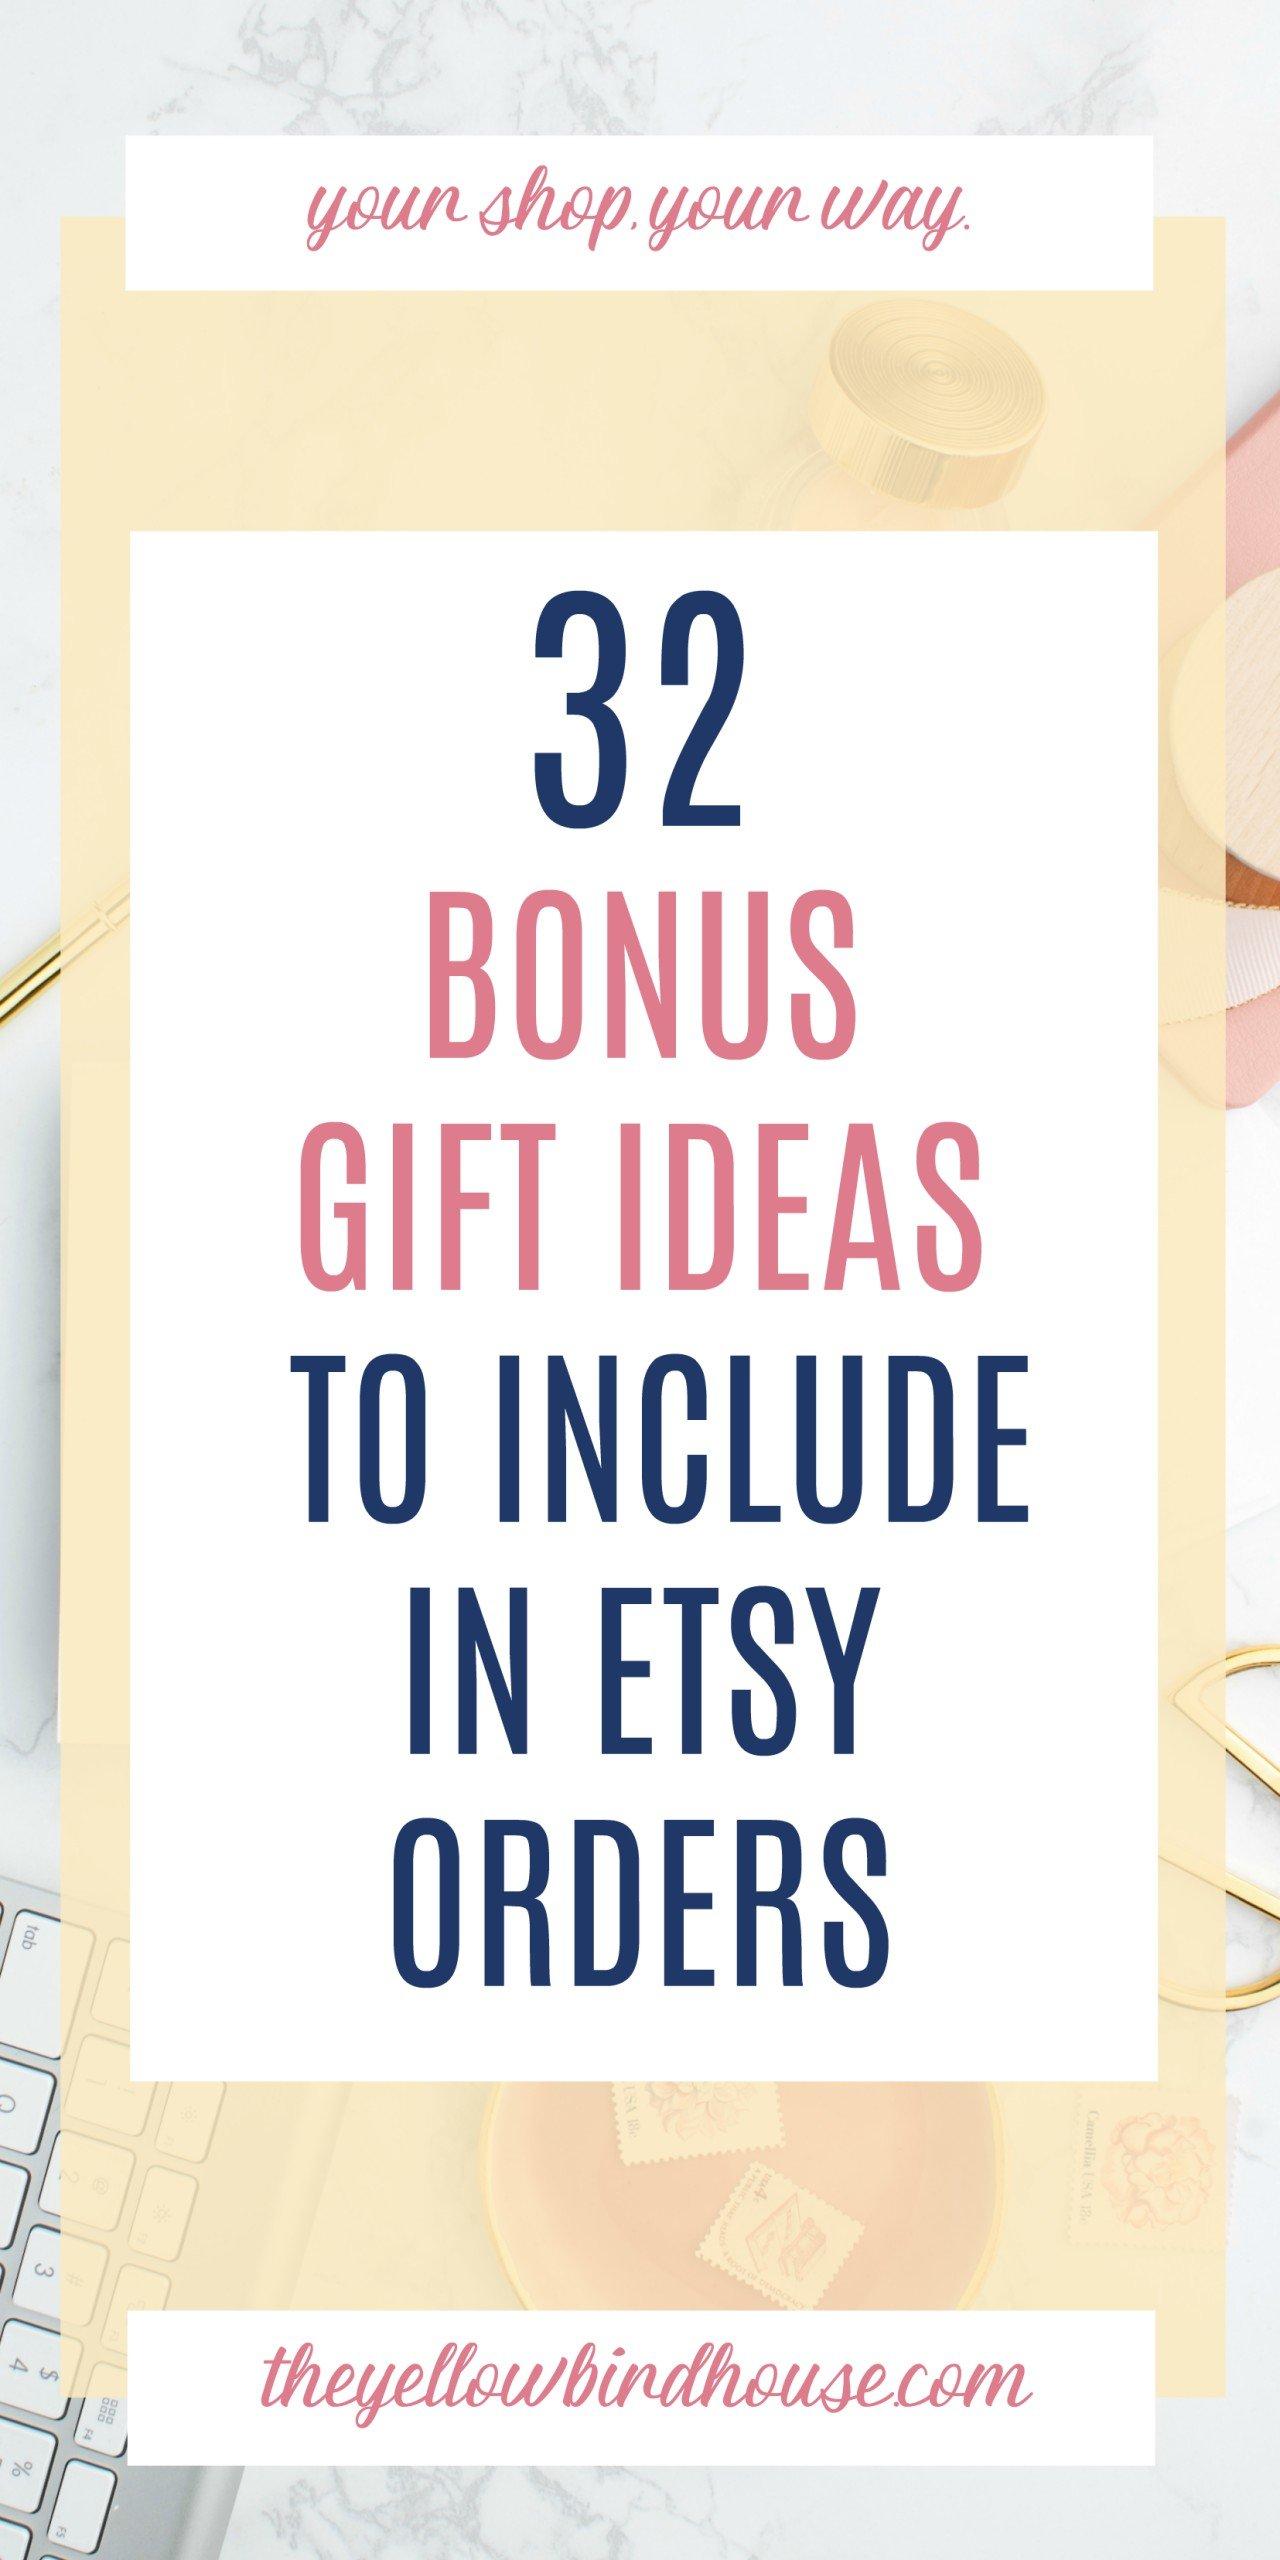 20 Bonus Gift Ideas for Etsy Orders   The Yellow Birdhouse